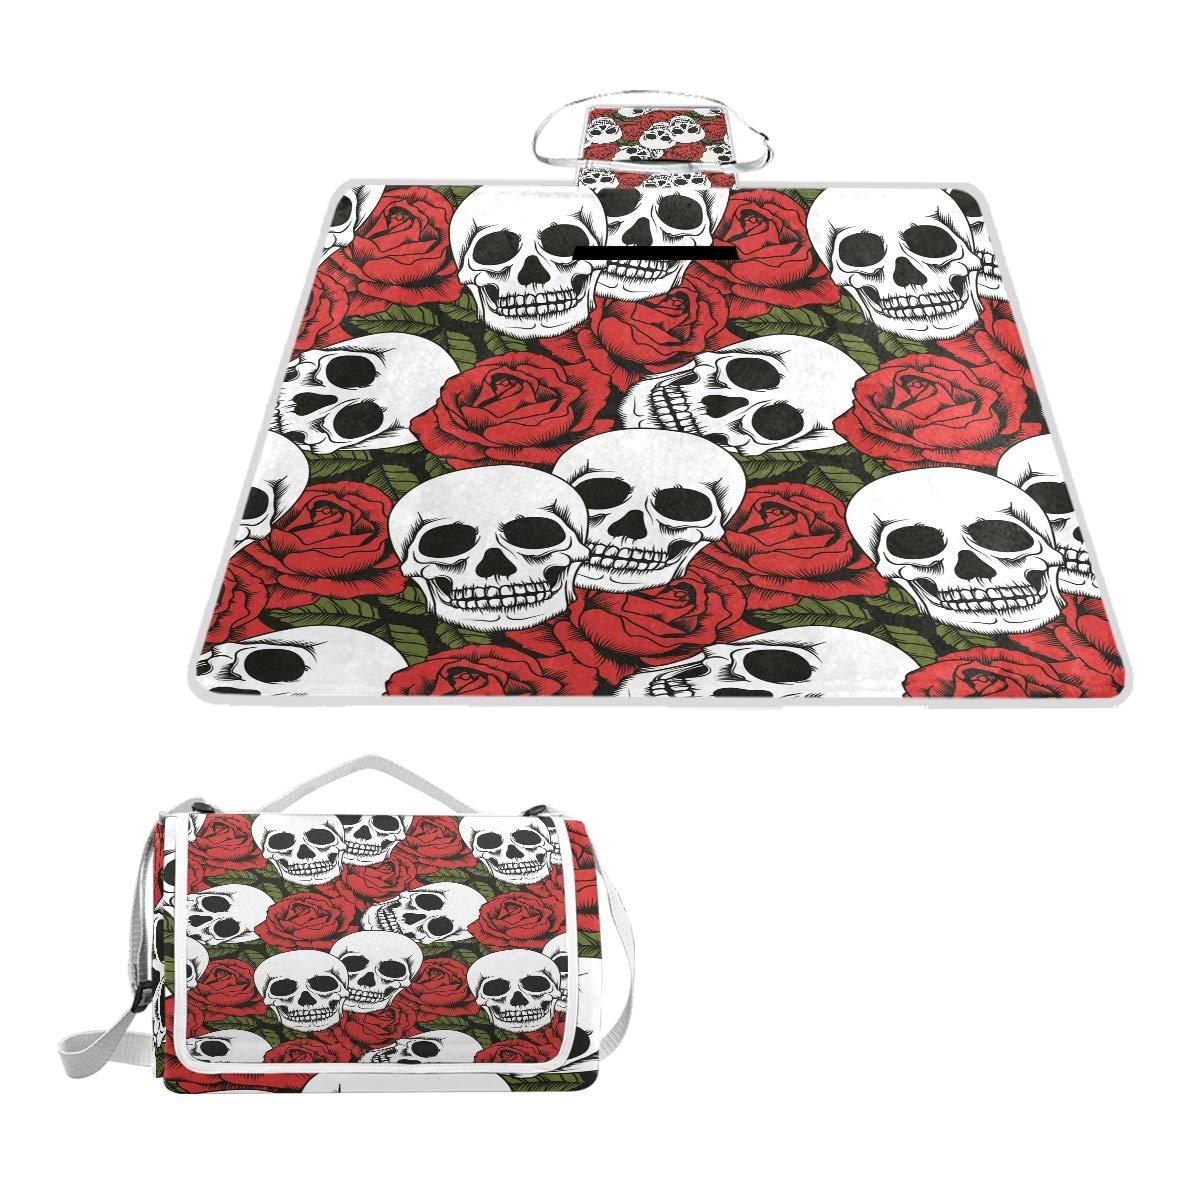 Anyangquji Skull and Flowers Seamless Background Picnic Blanket 57''x59''